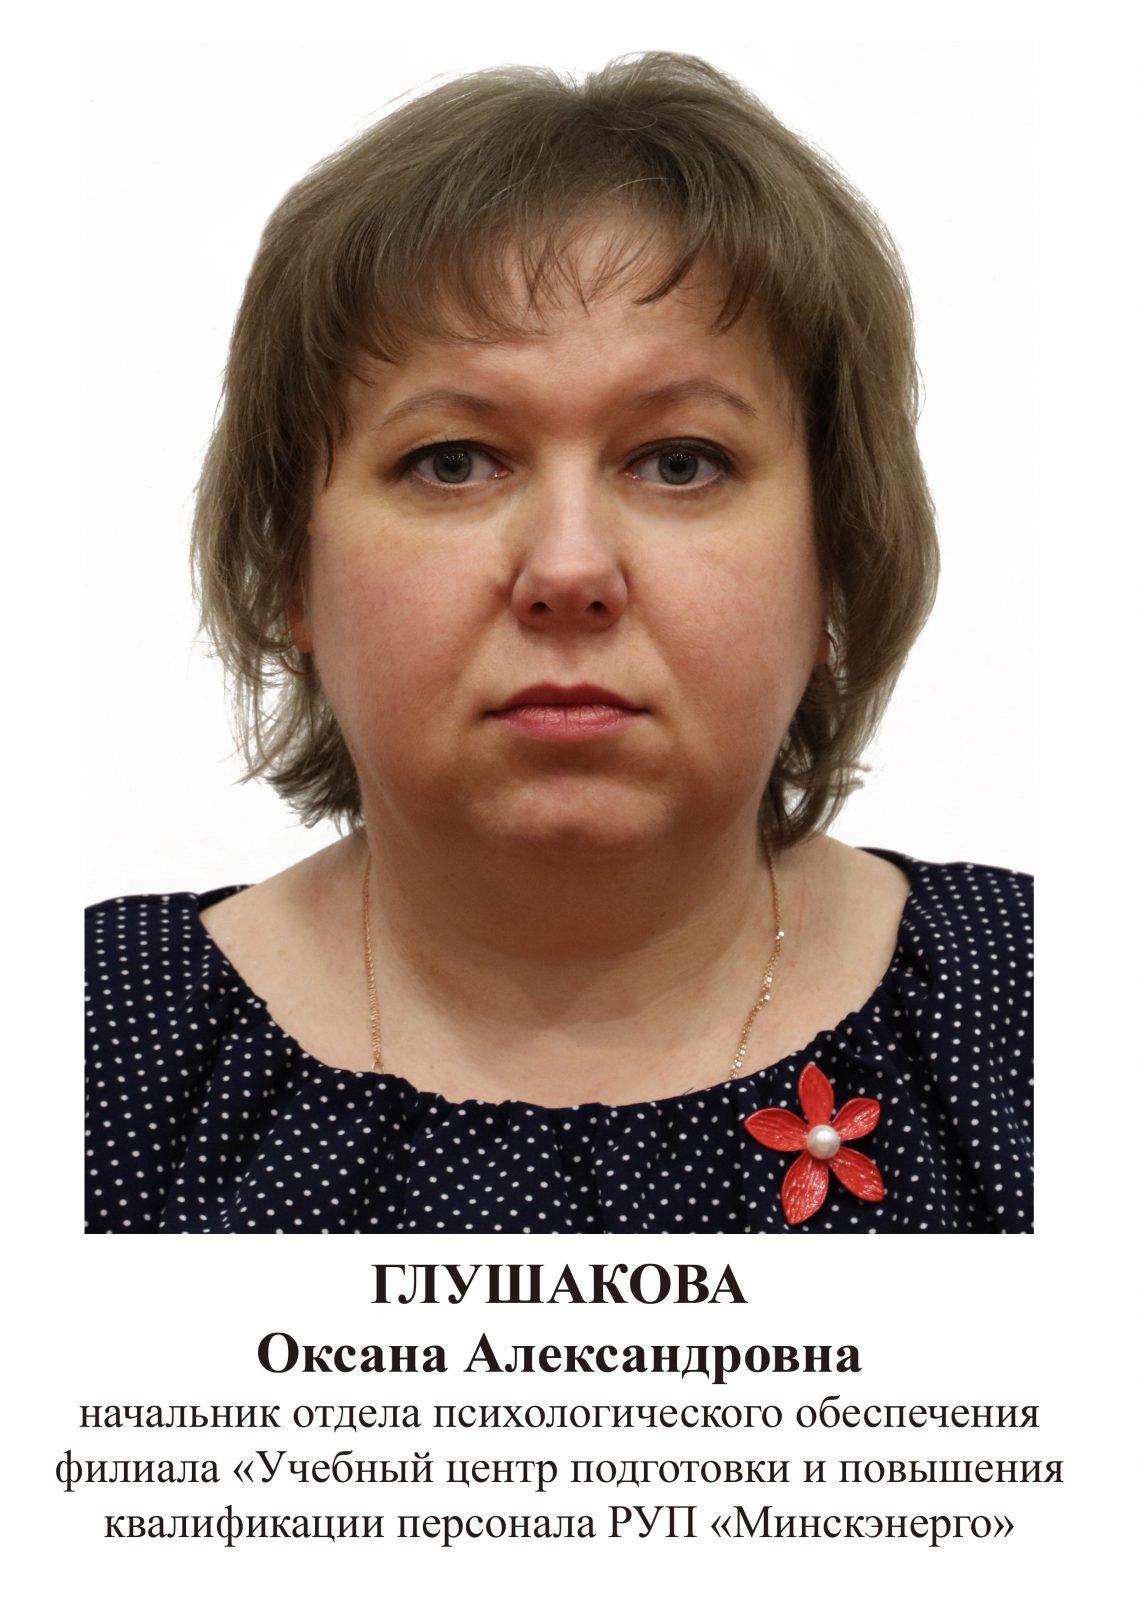 Глушакова Оксана Александровна